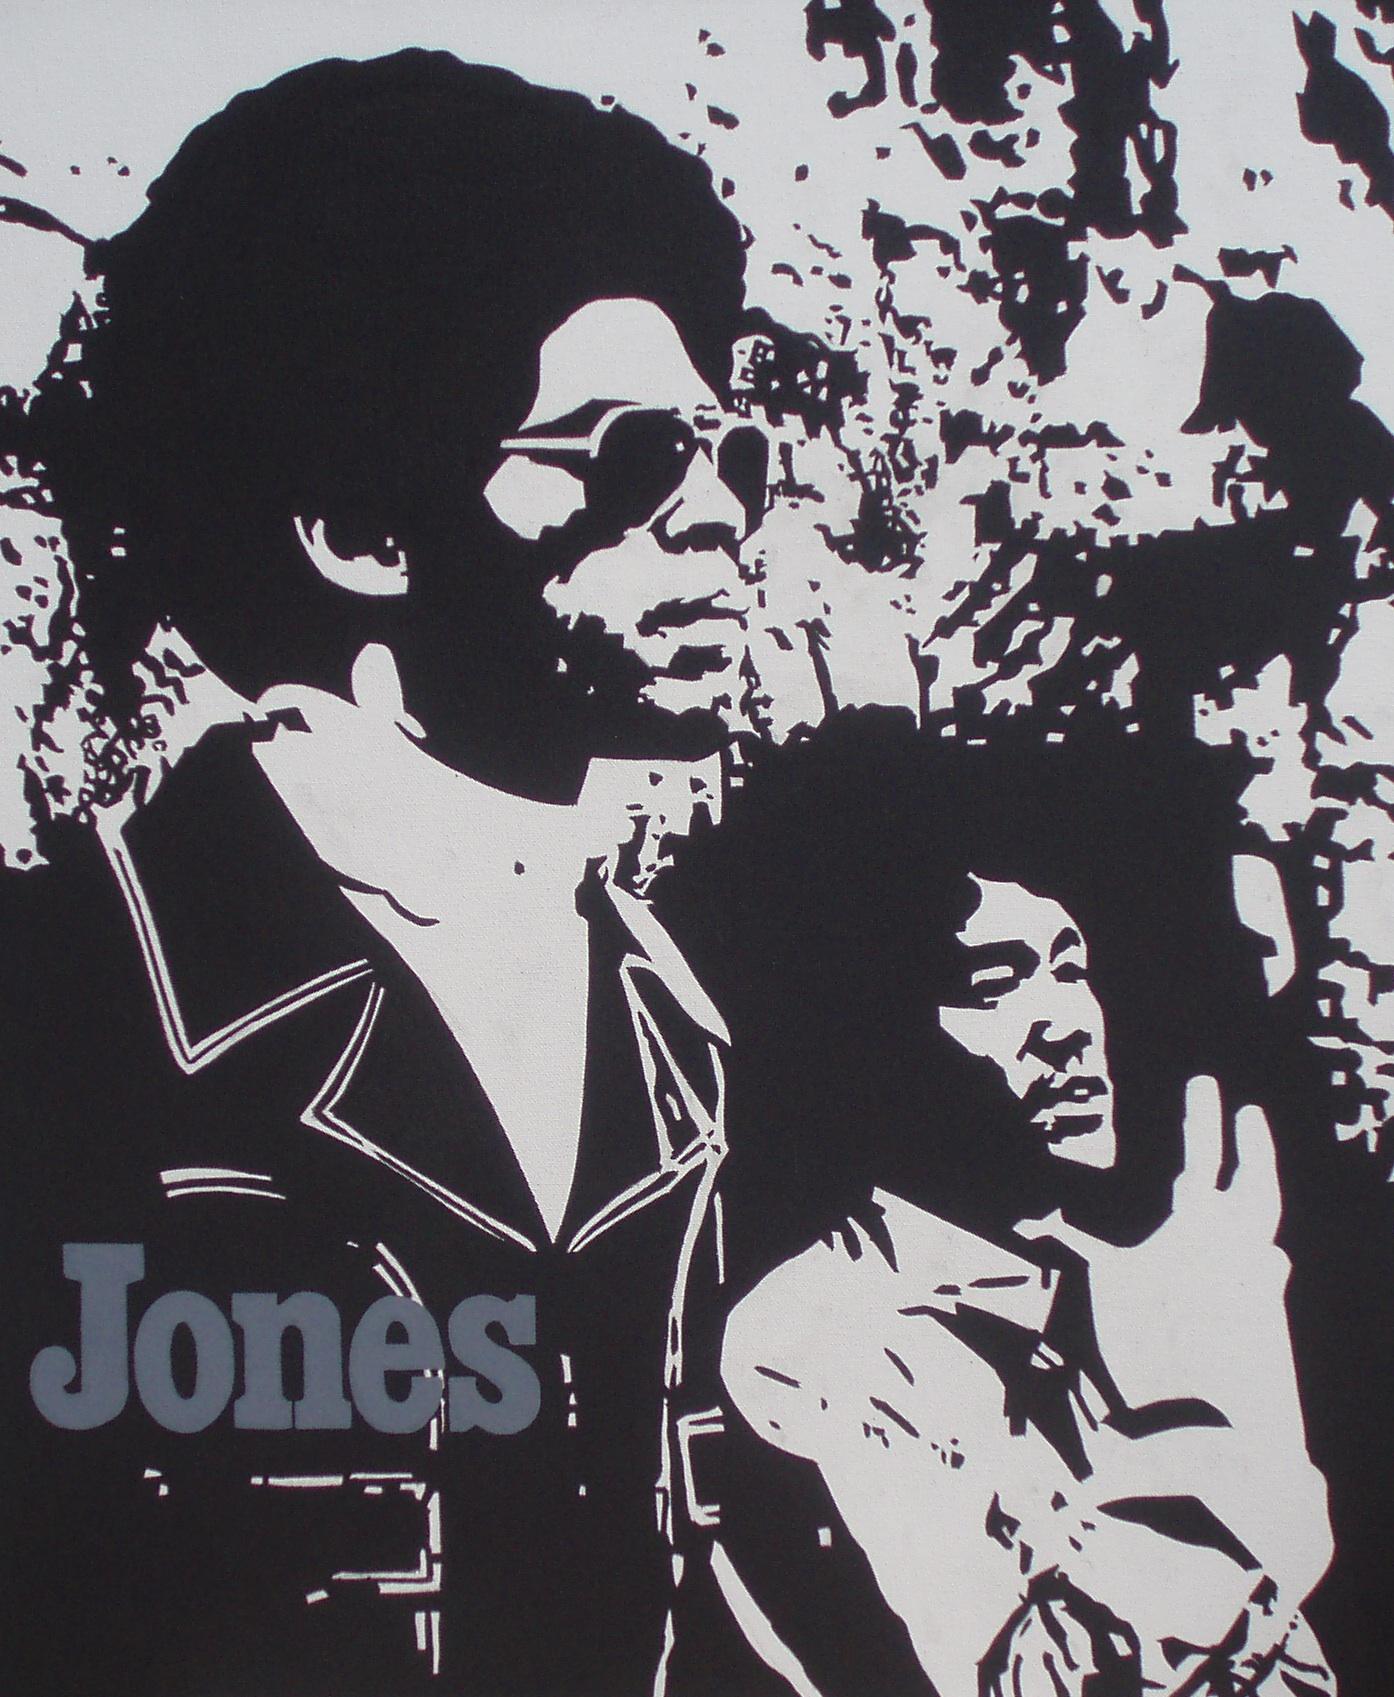 Black Belt Jones (3).jpg